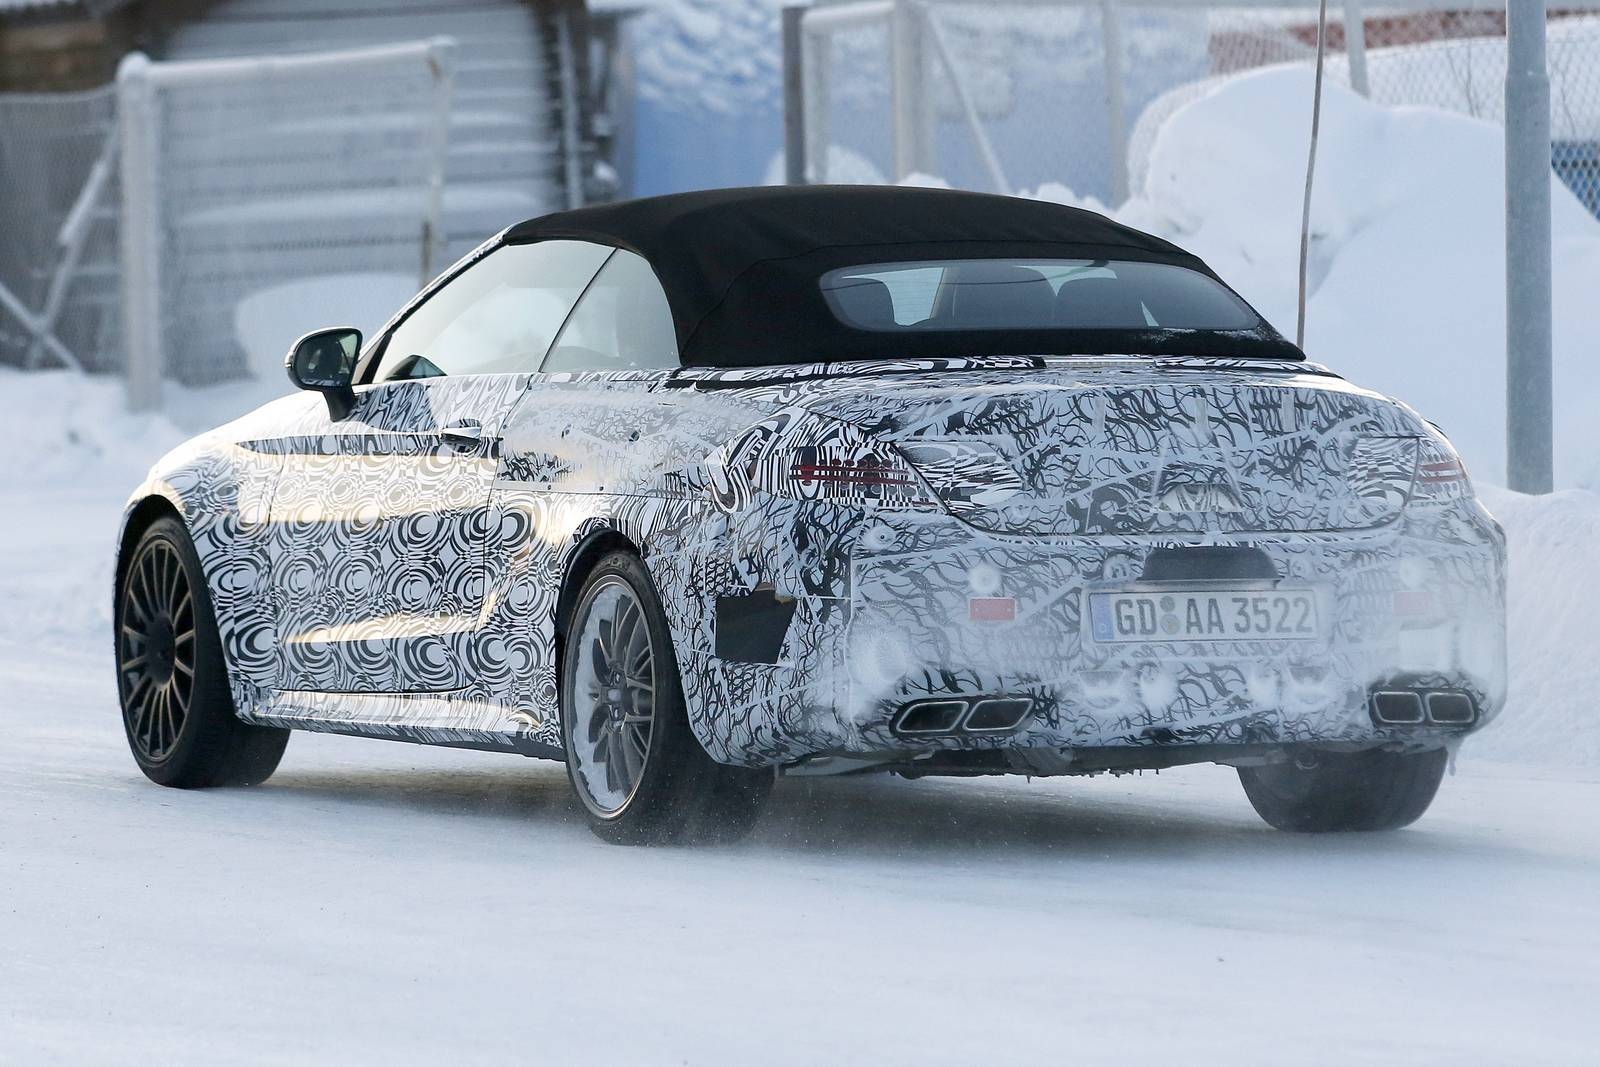 http://www.musclecarszone.com/wp-content/uploads/2016/01/2017-Mercedes-Benz-C63-AMG-Cabriolet-Spy-Shots-5.jpg